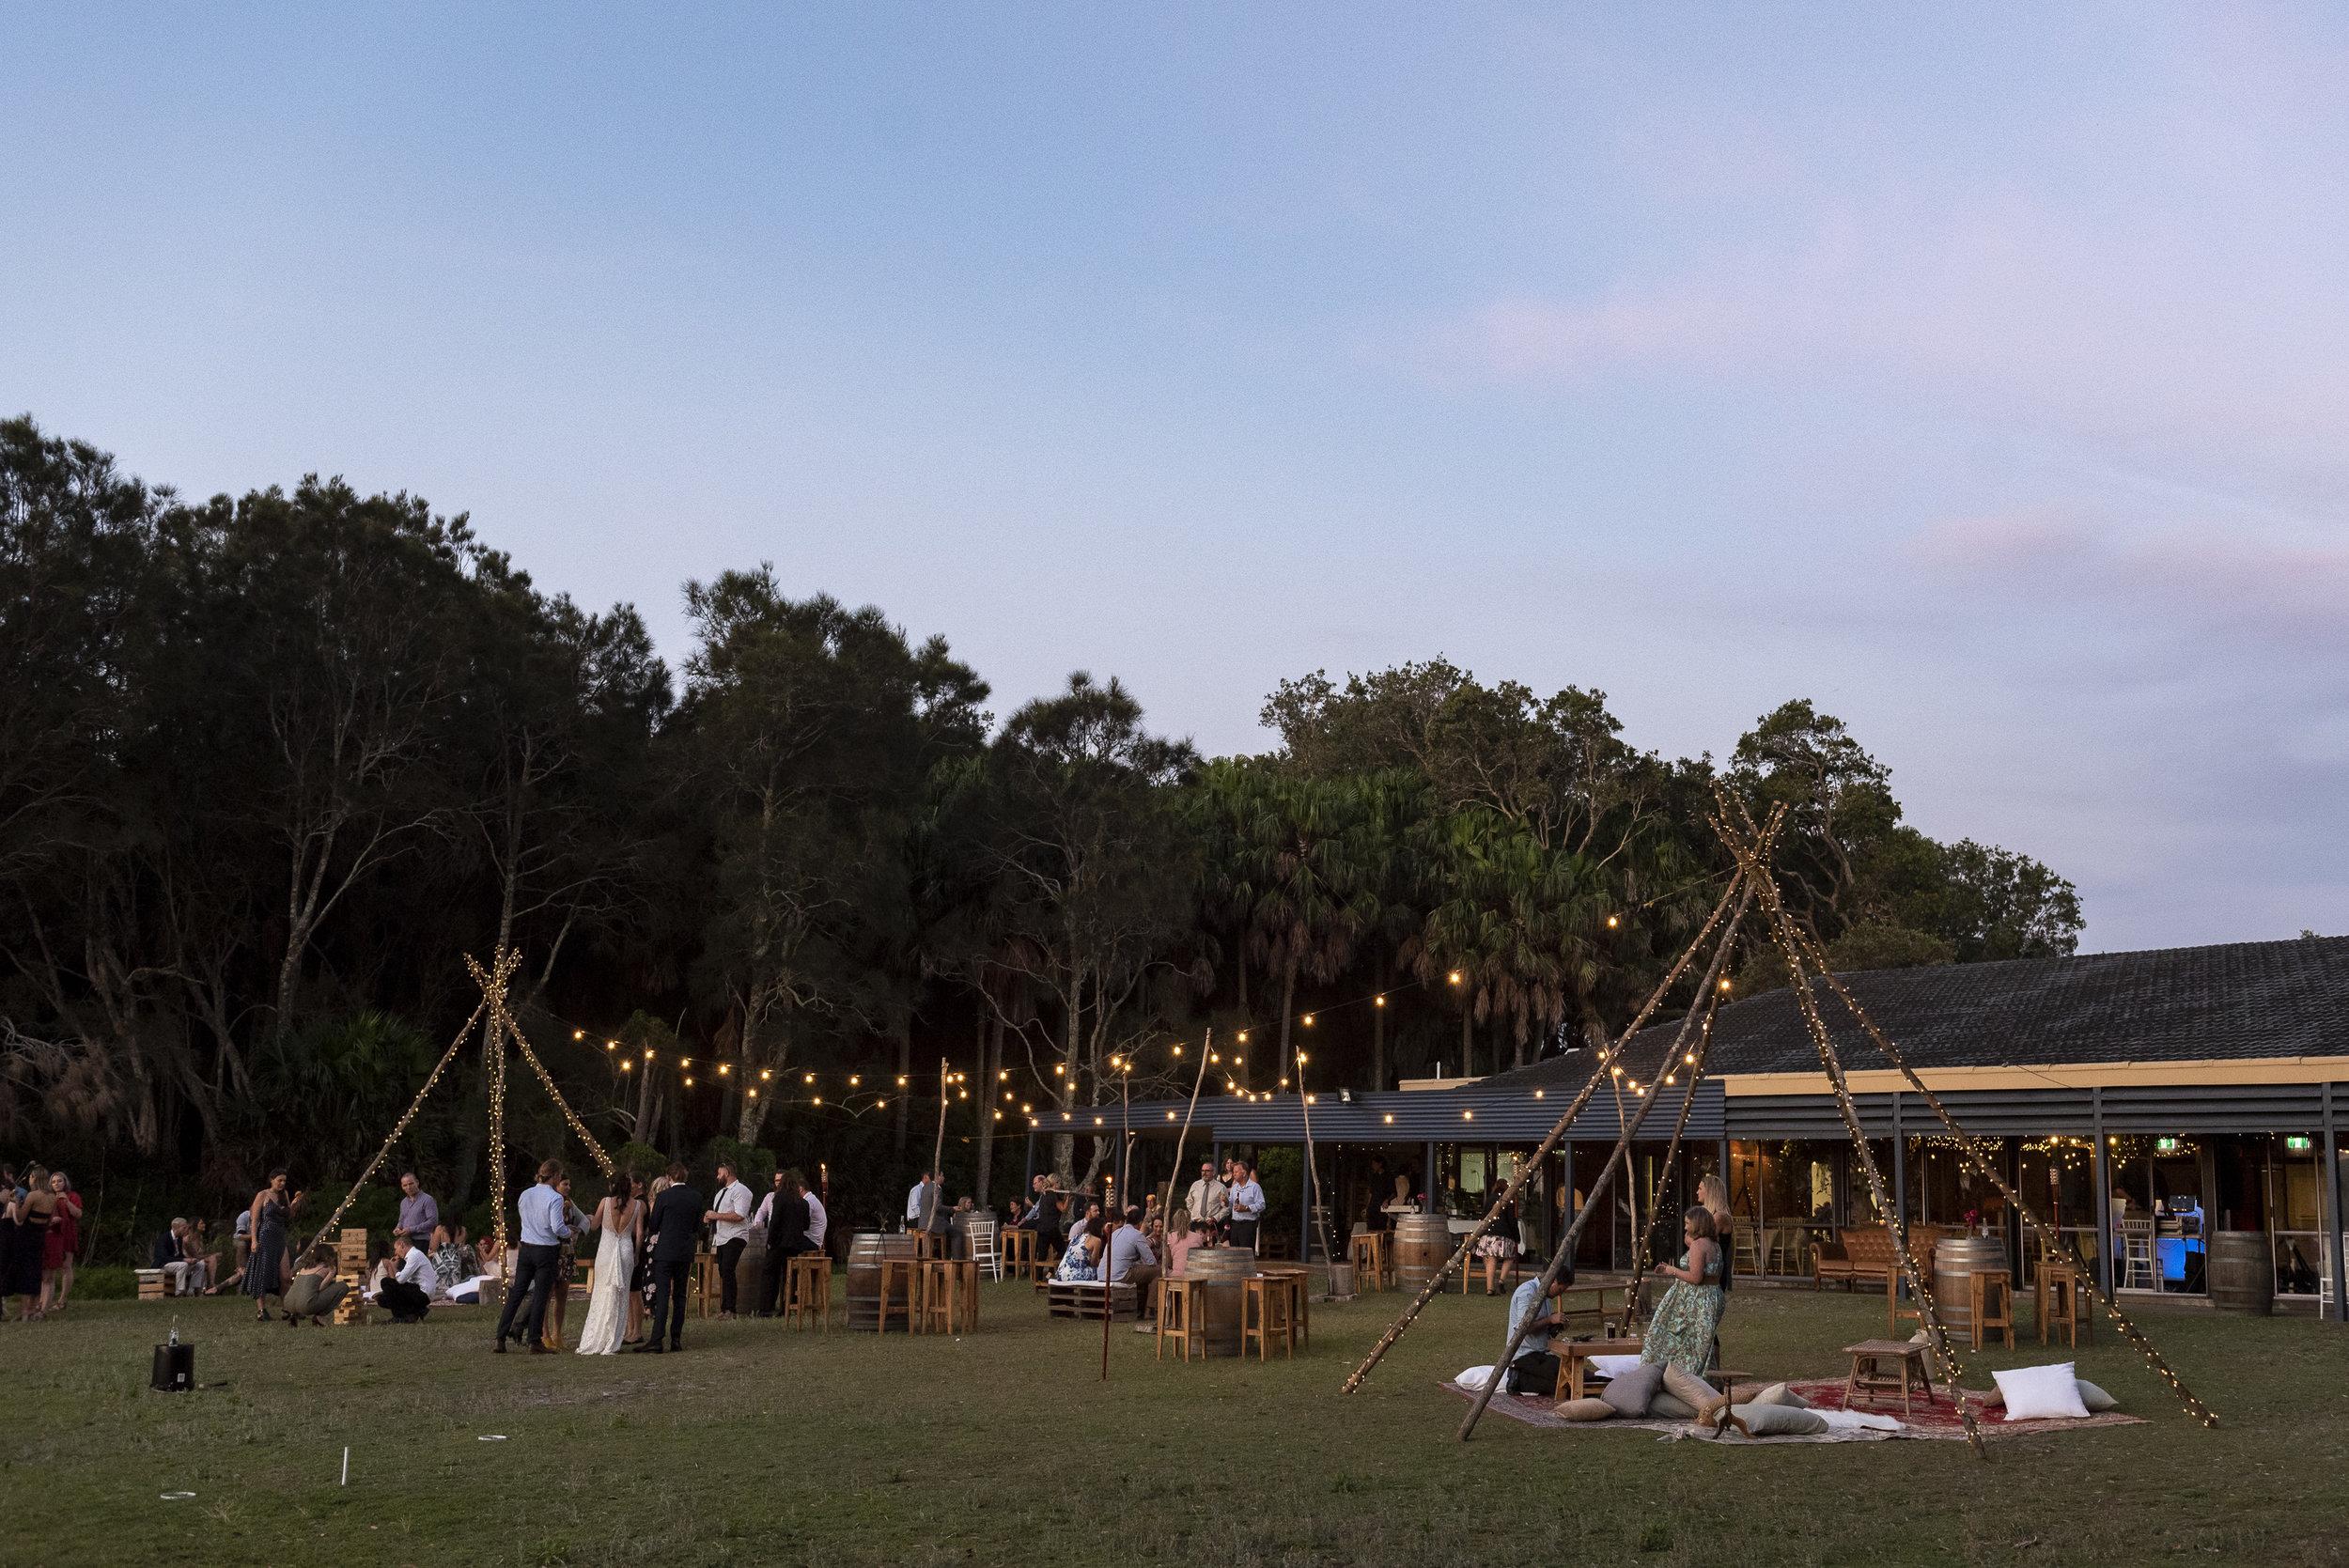 weddings+by+atelier+photography-wedding-37.jpg